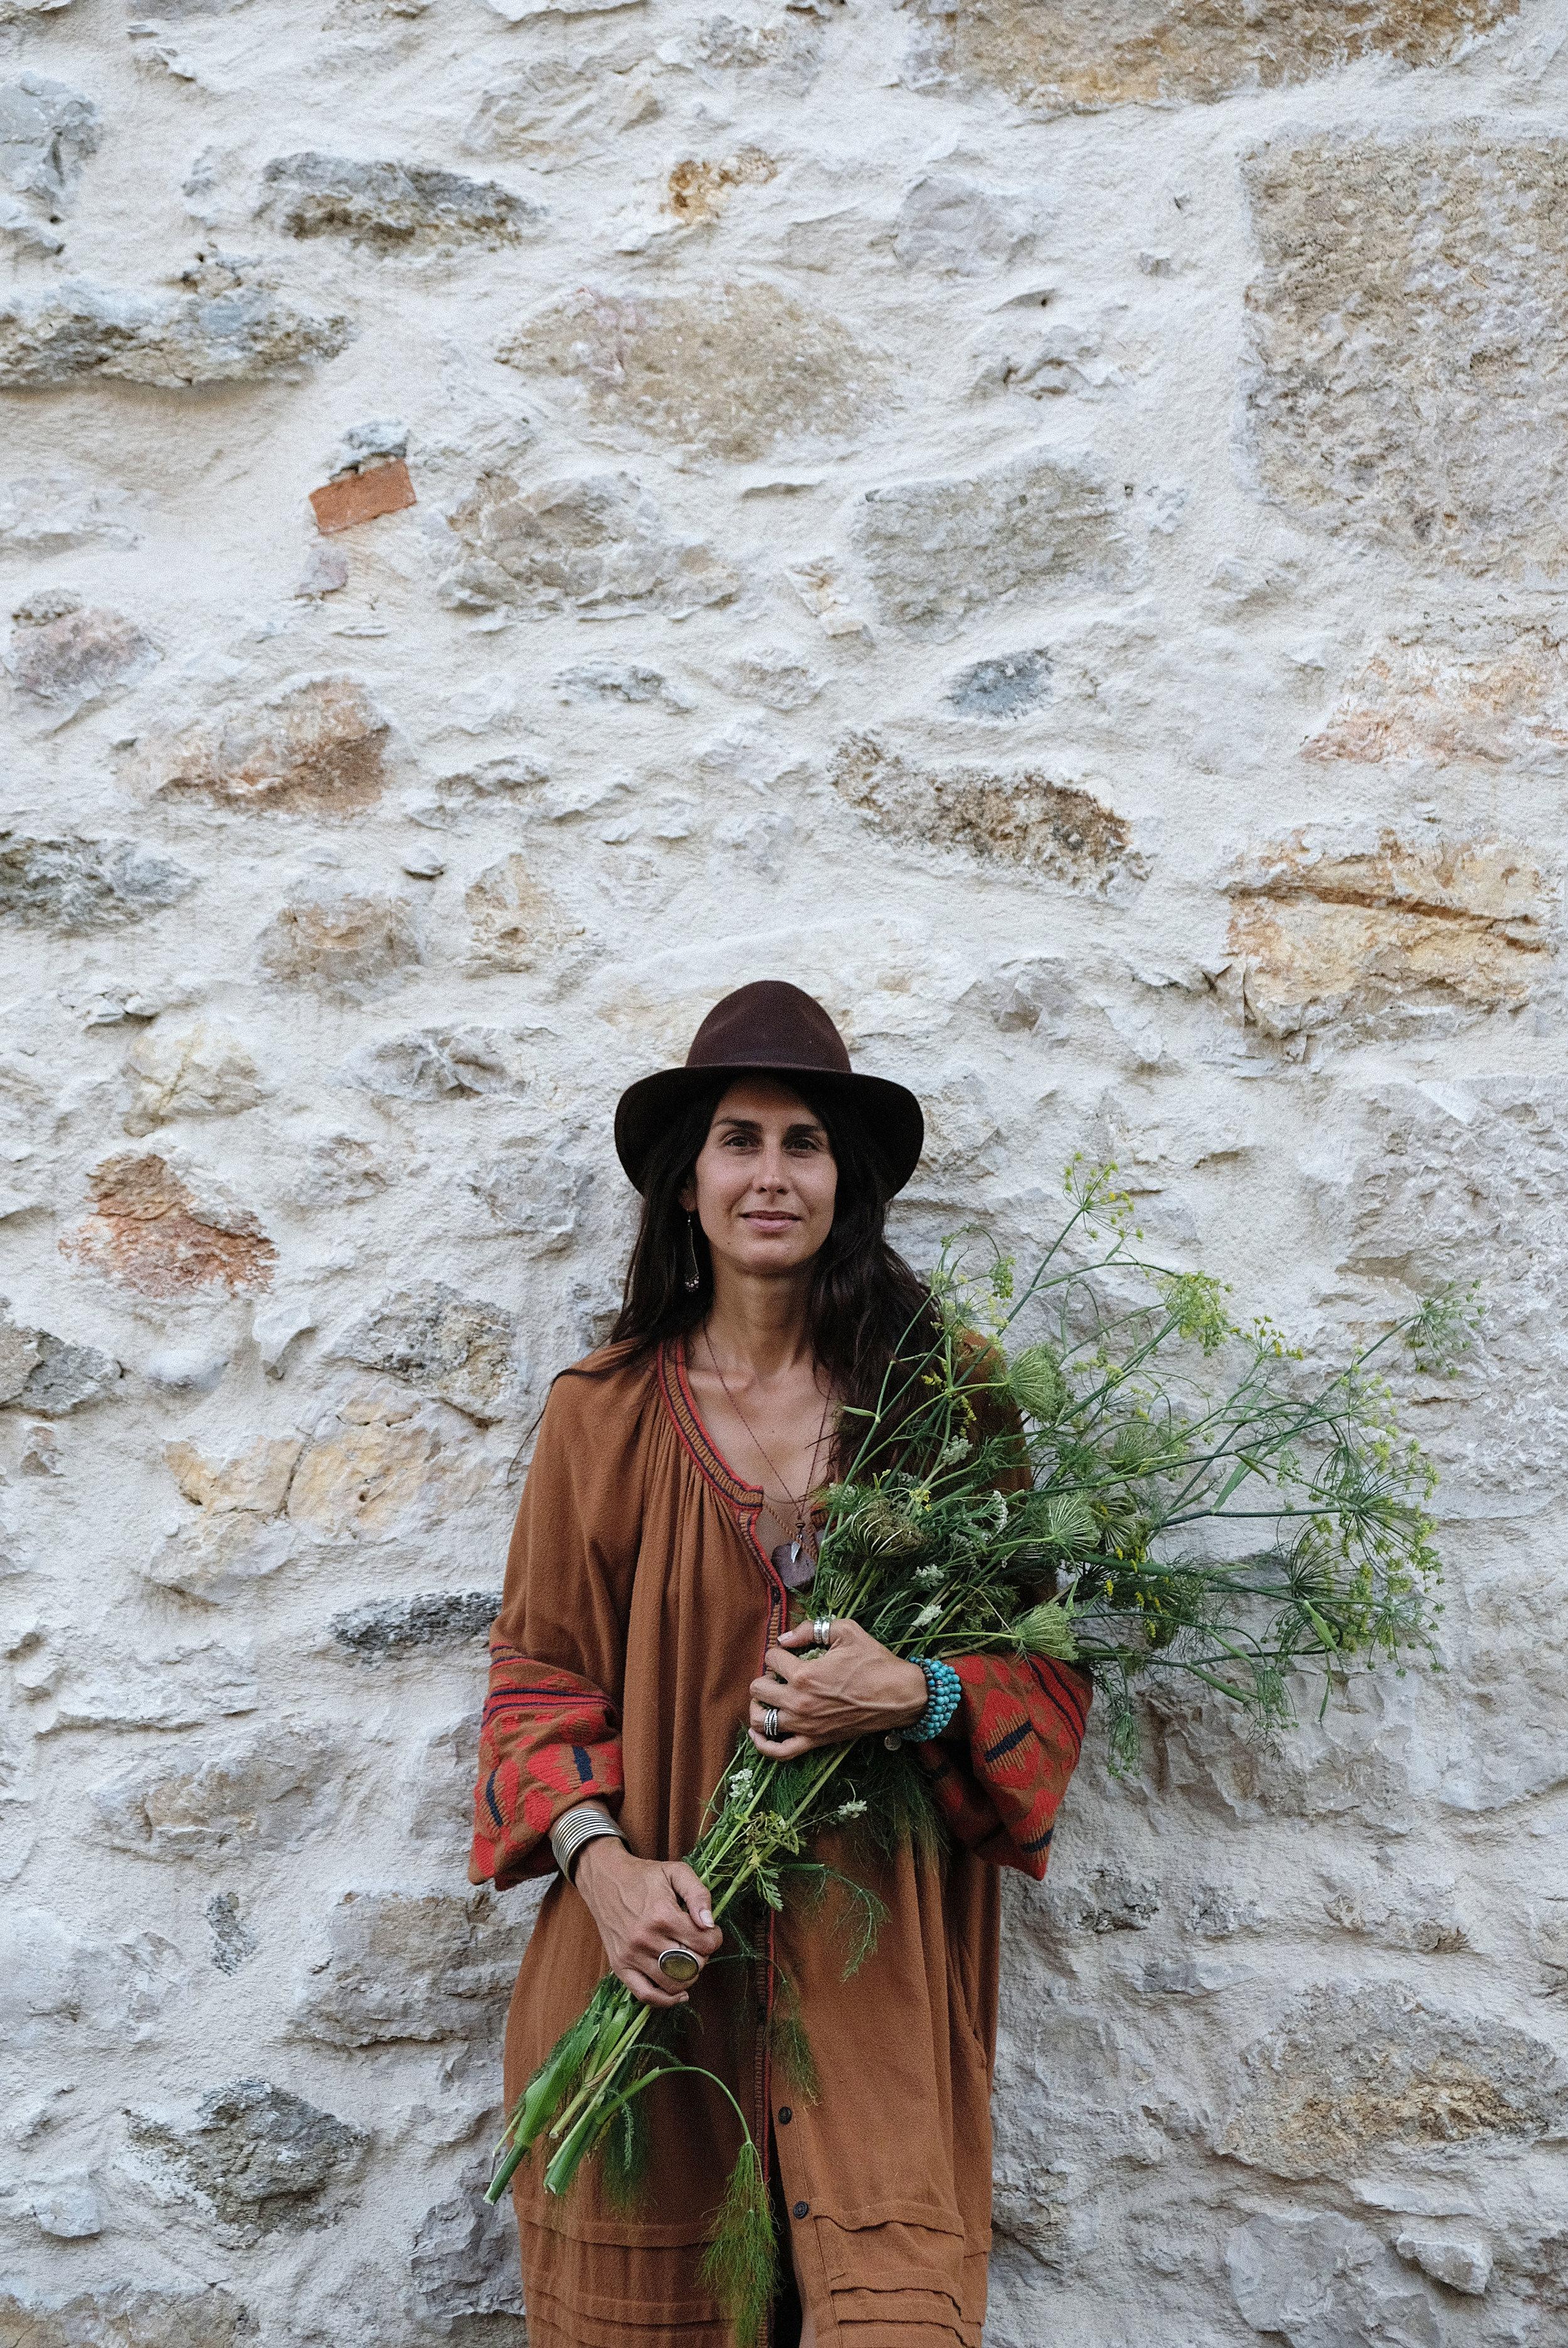 Severine perron - awa - asweare - speaker - les herbes vives